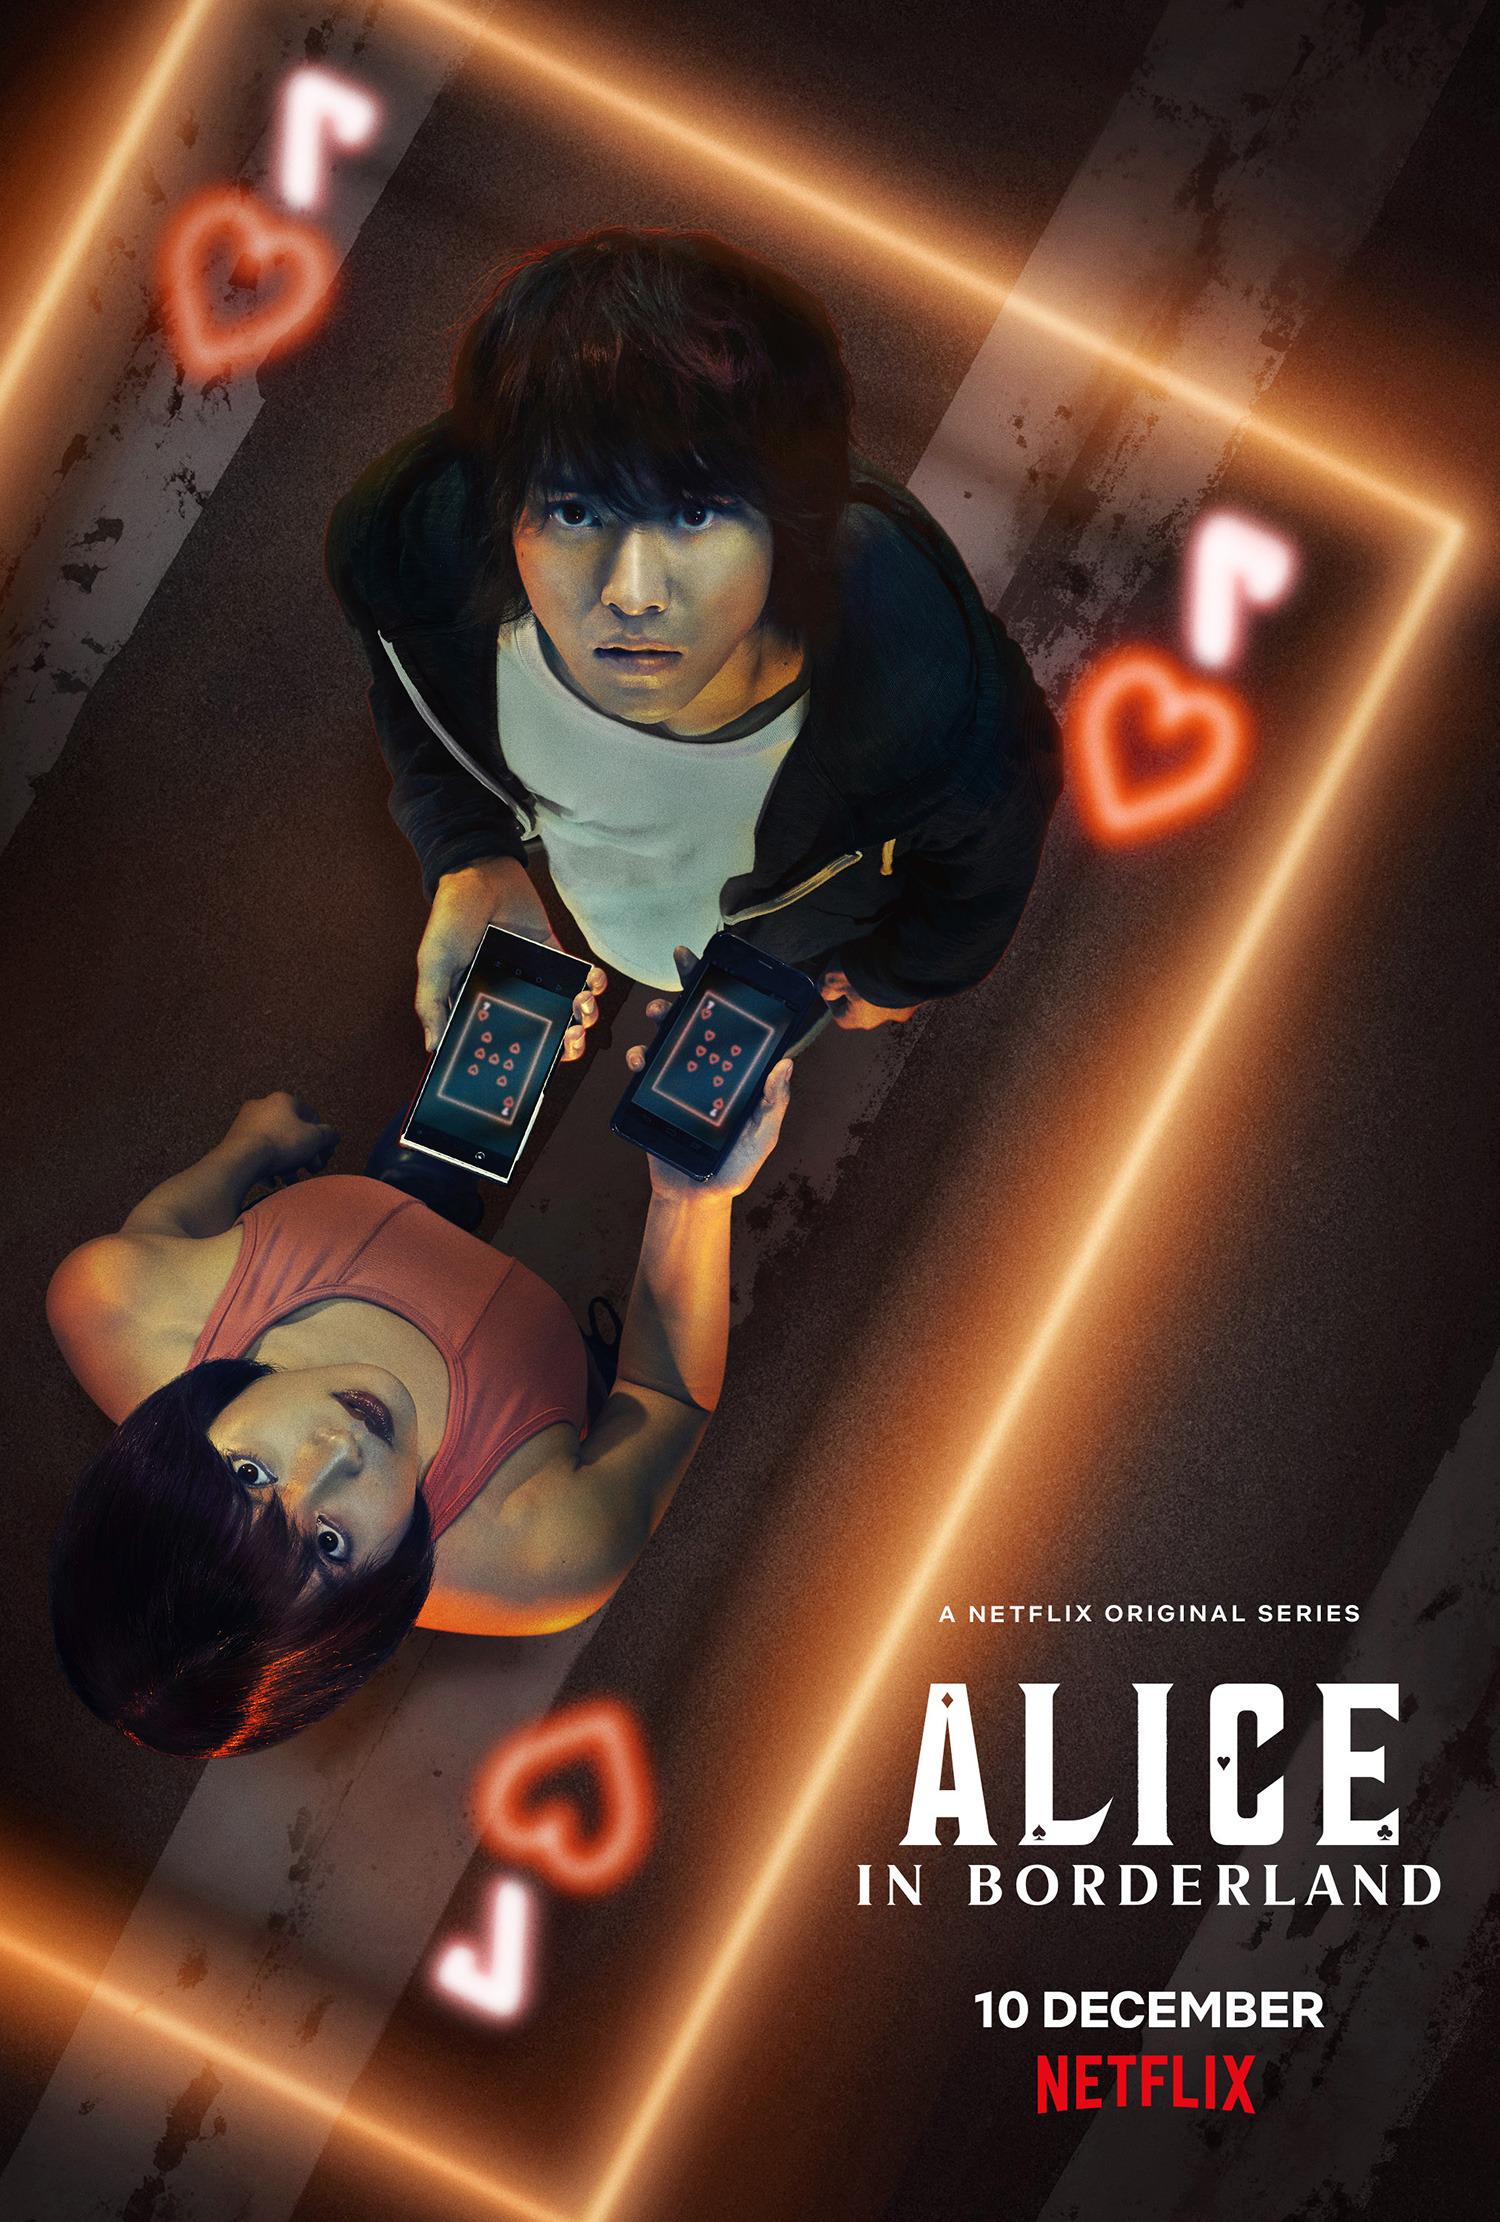 Alice_in_Borderland_(Netflix)_Season_1_Poster_01